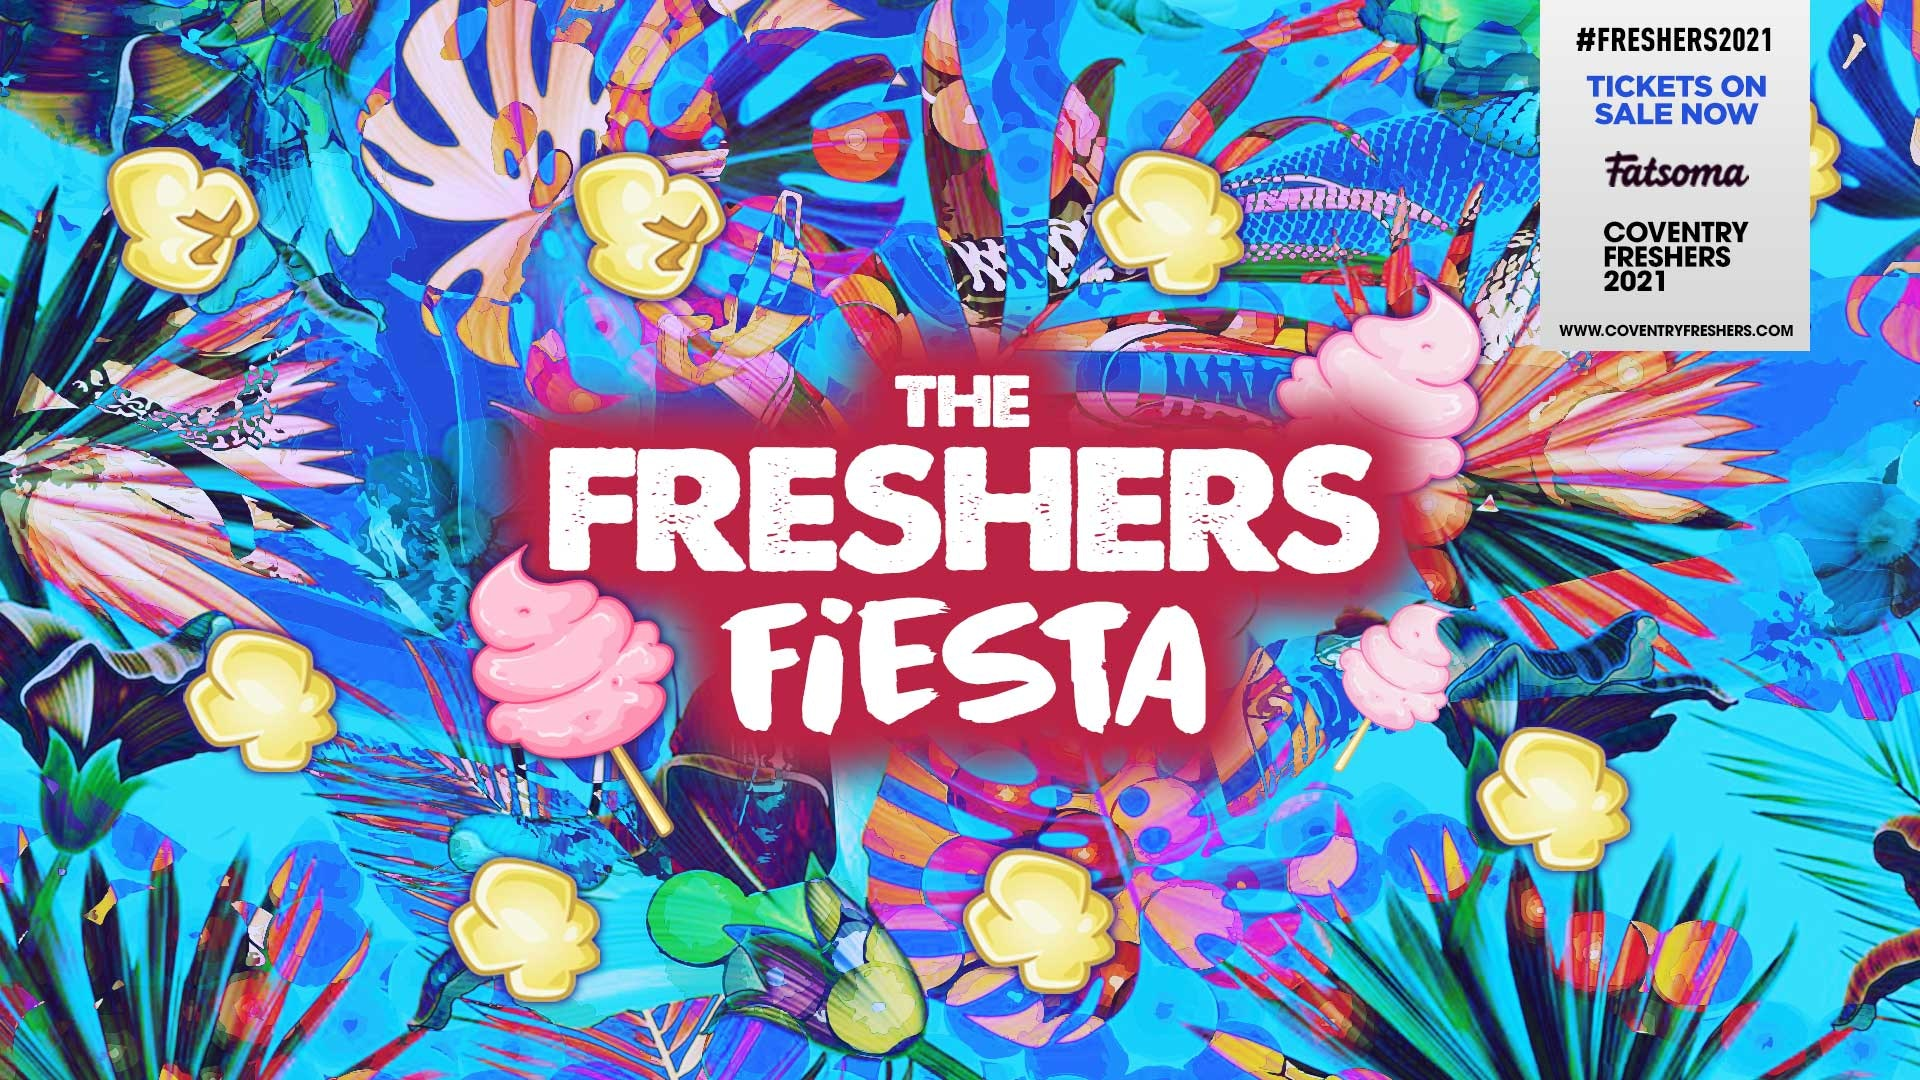 Freshers Fiesta | Coventry Freshers 2021